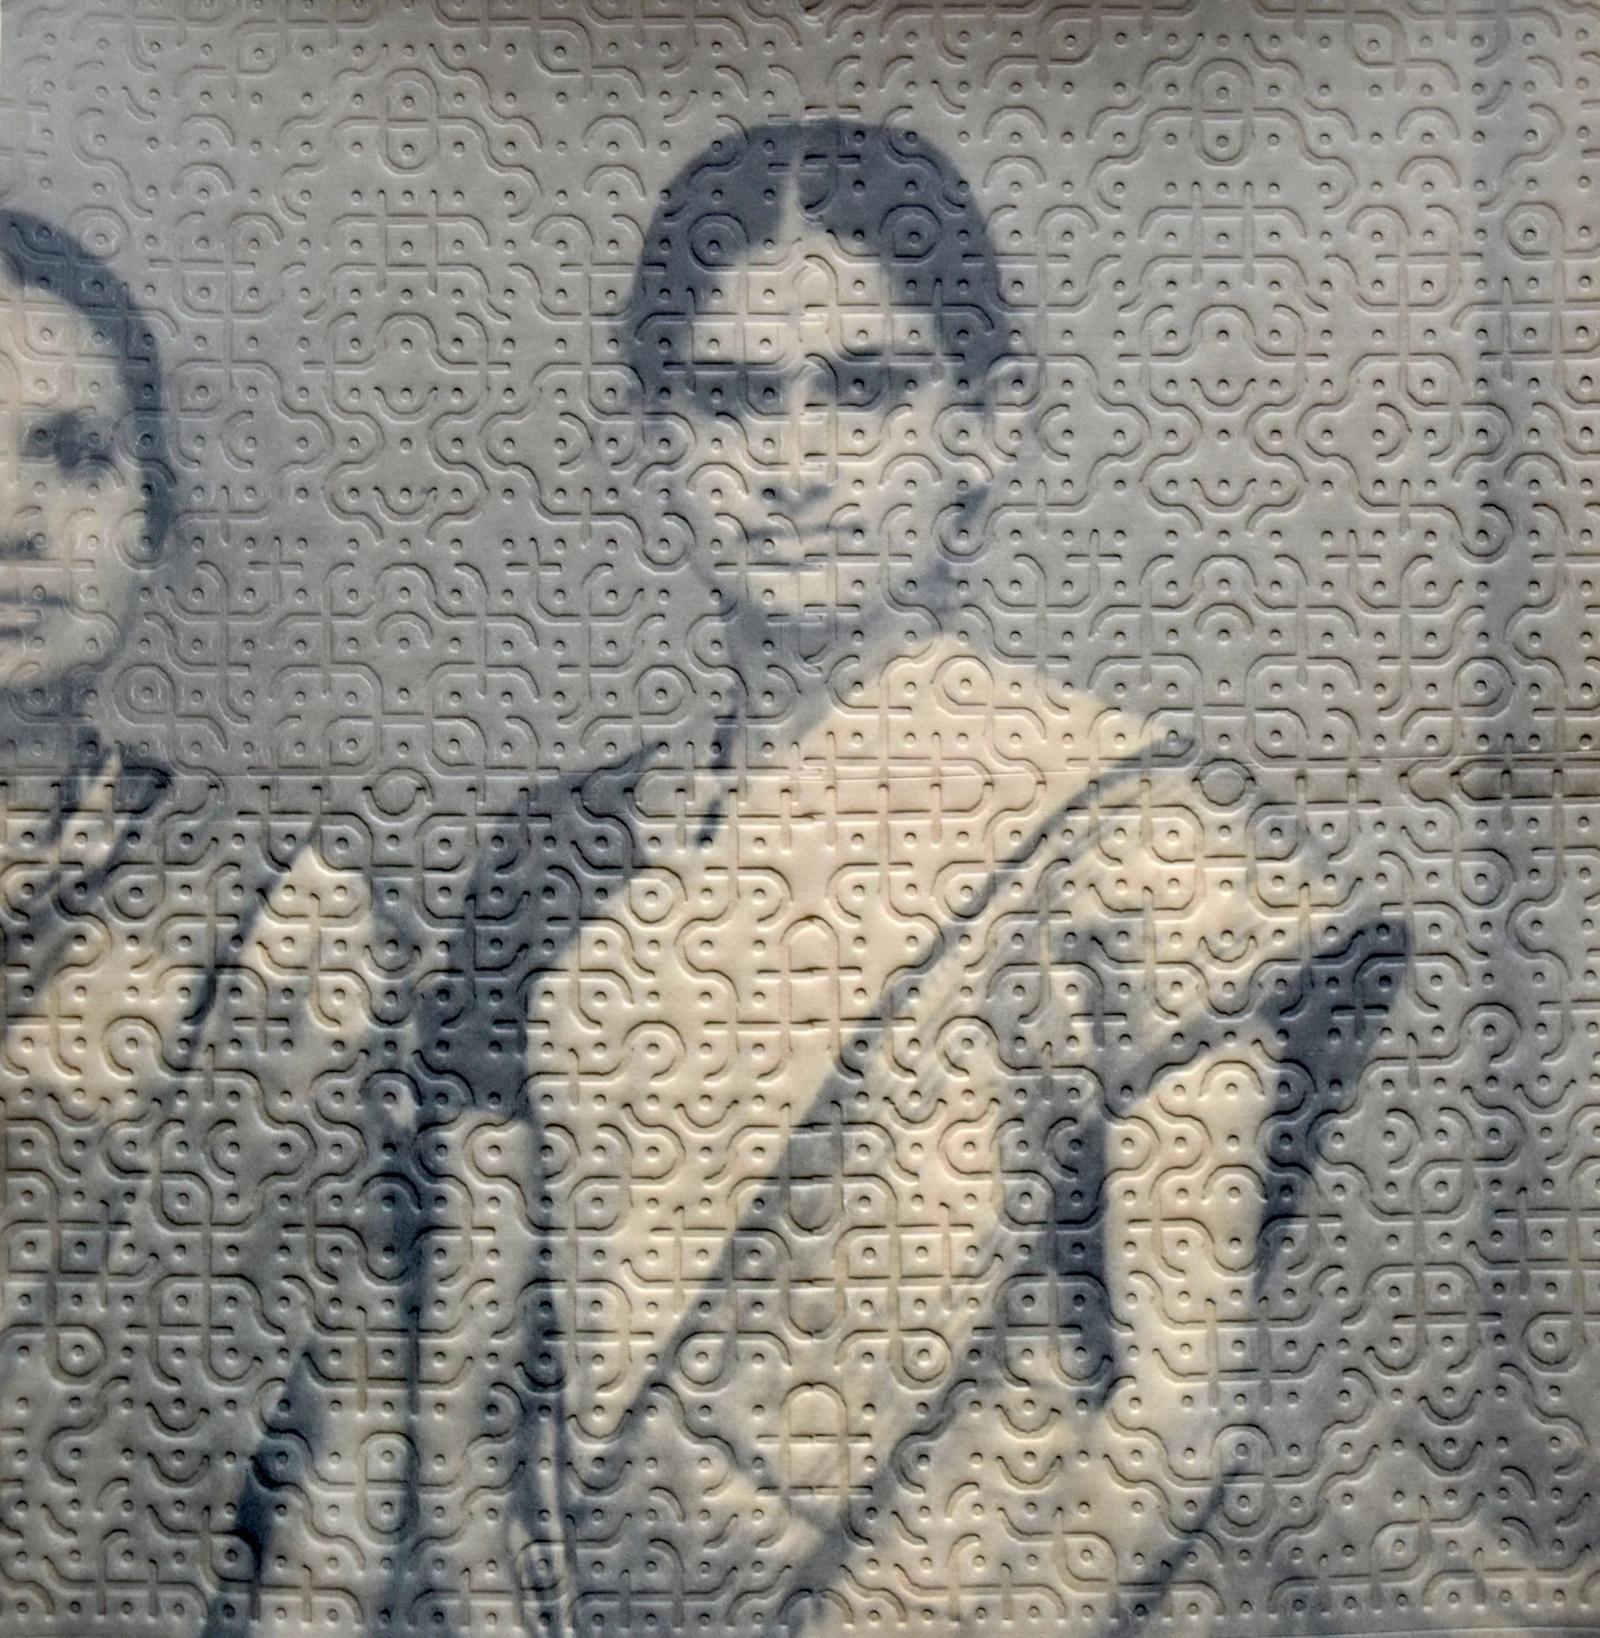 Black and white portrait of Akkapeddi's grandmother.